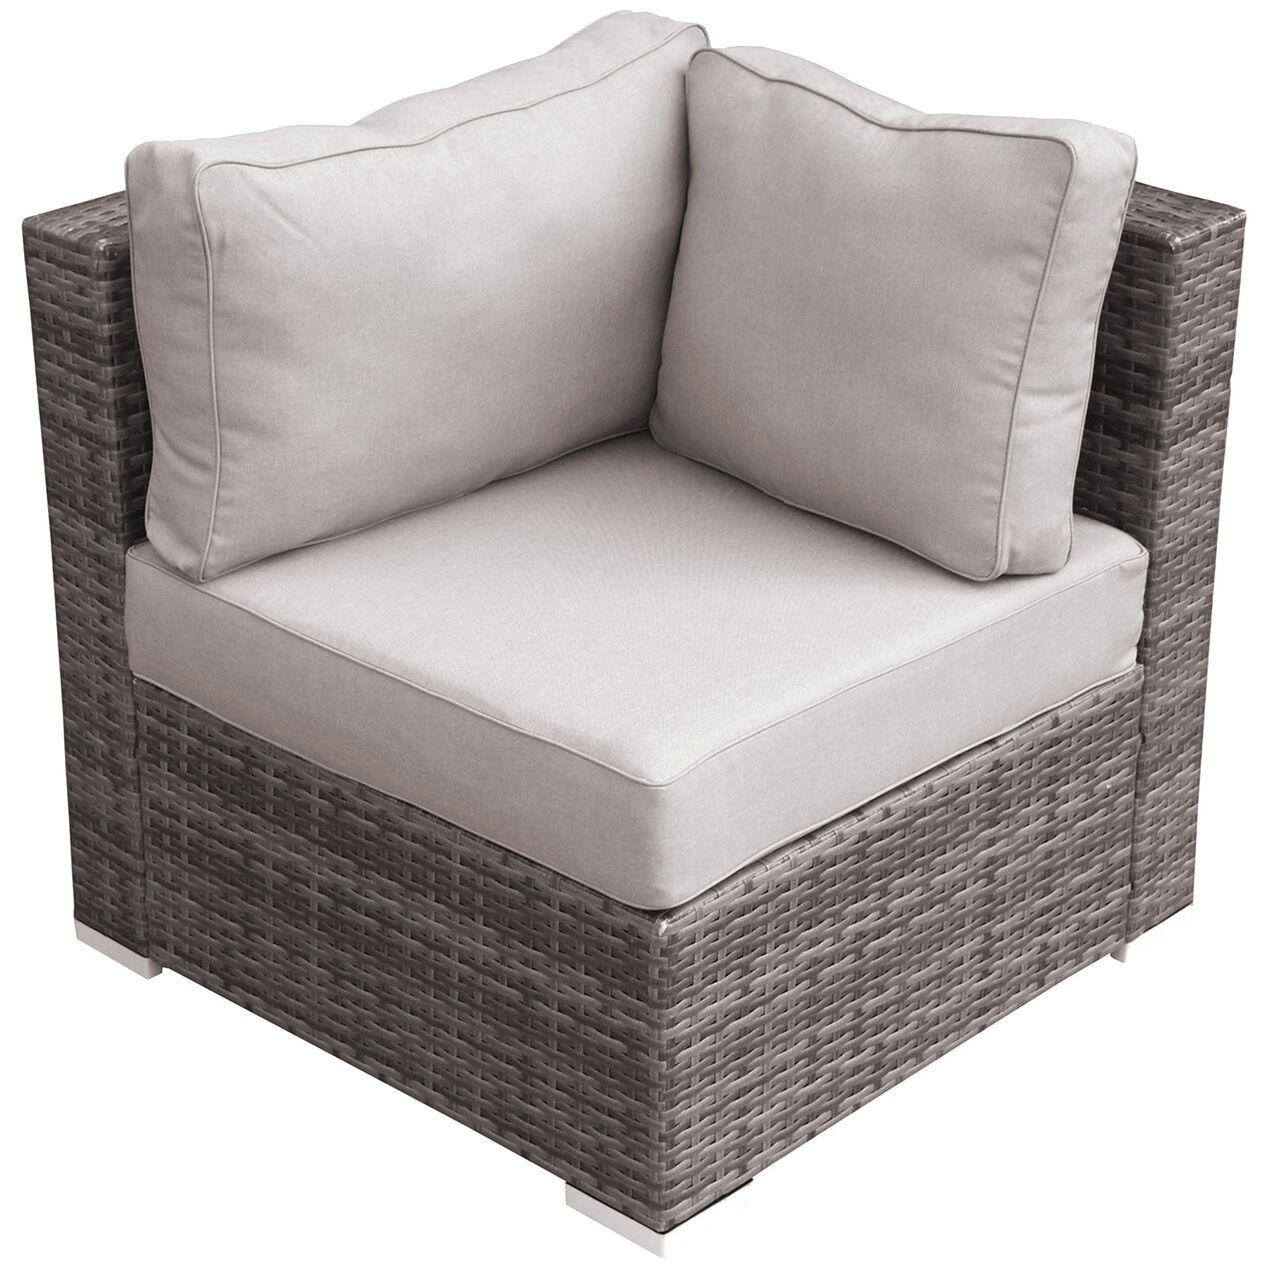 Weston Ii Corner Chair In 2020 Corner Chair Gray Patio Furniture Furniture